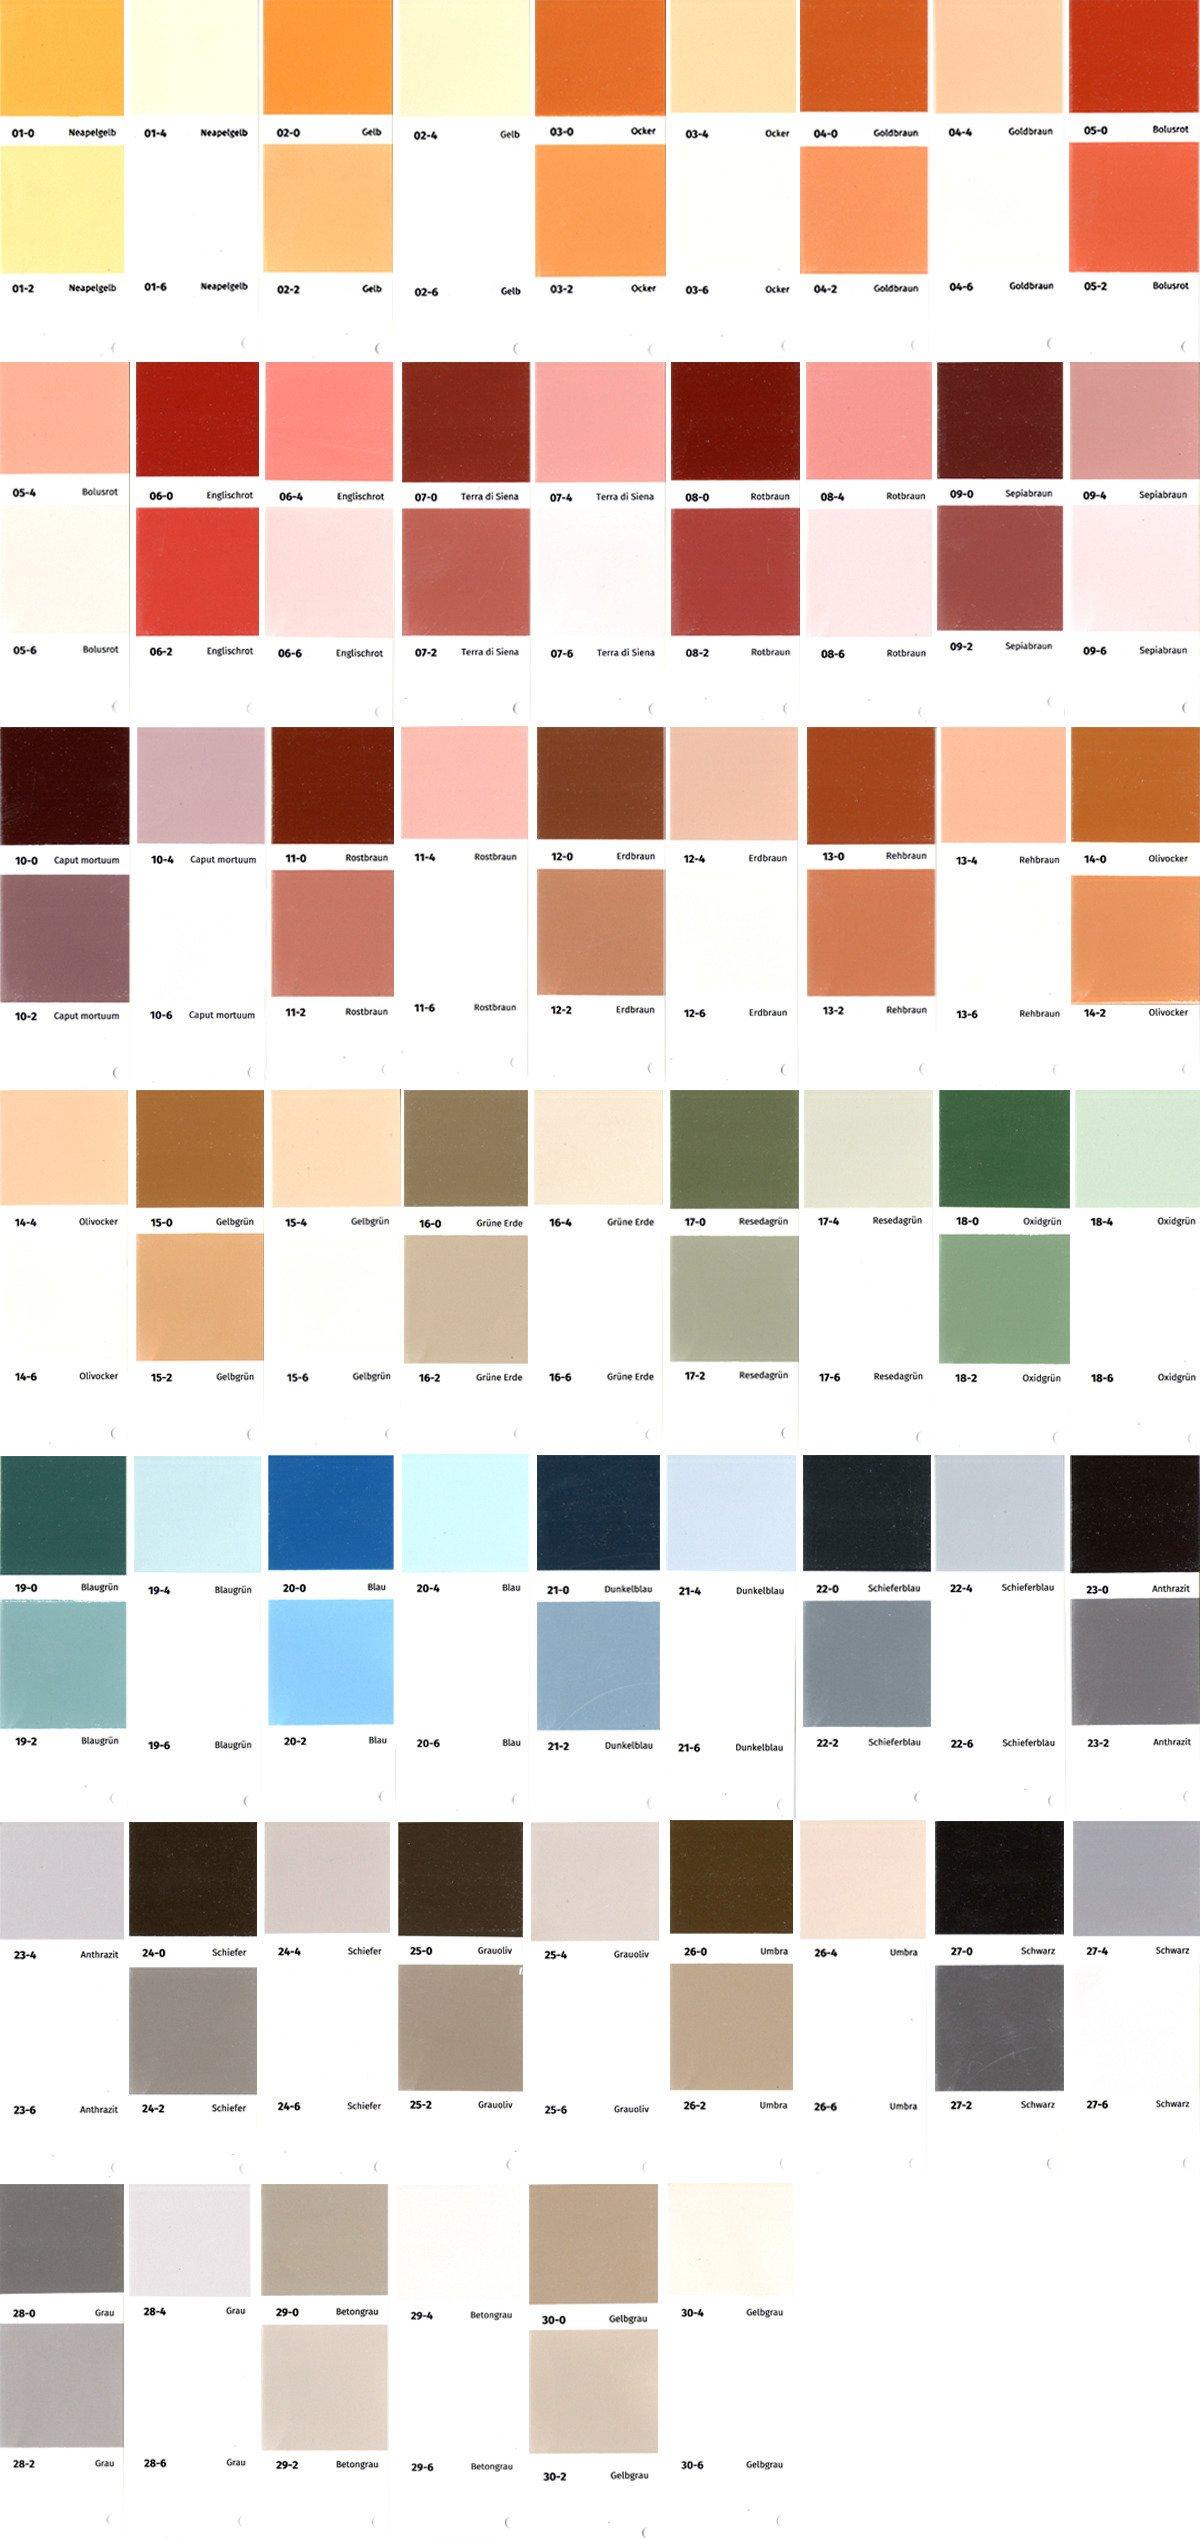 remmers siliconfarbe color sf fassadenfarbe 5 l farbtonkollektion farbtonkollektion. Black Bedroom Furniture Sets. Home Design Ideas